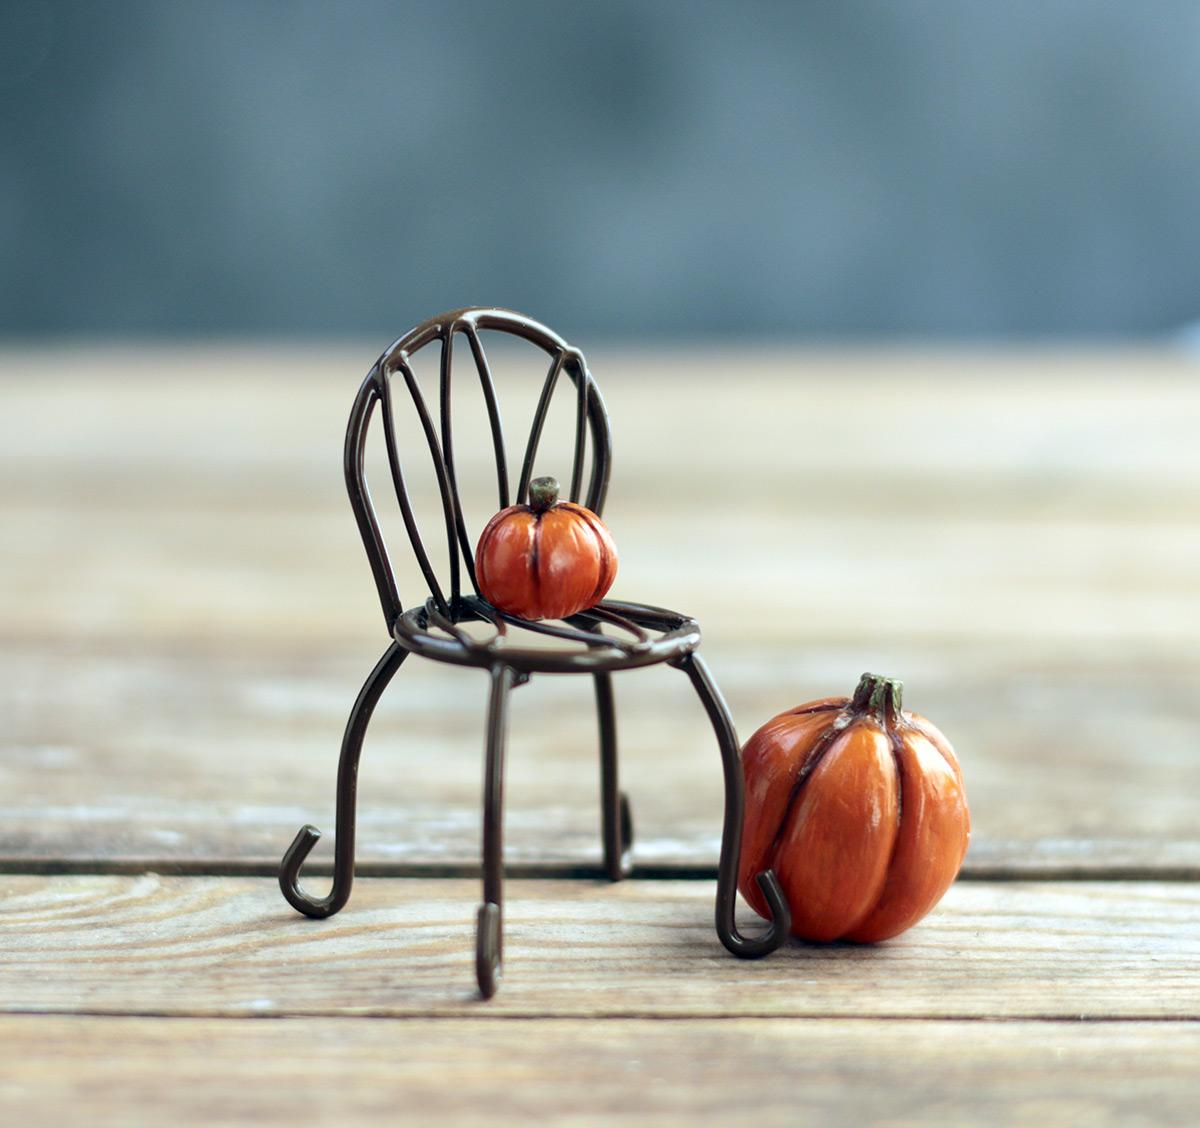 Small Miniature Pumpkin Figurine